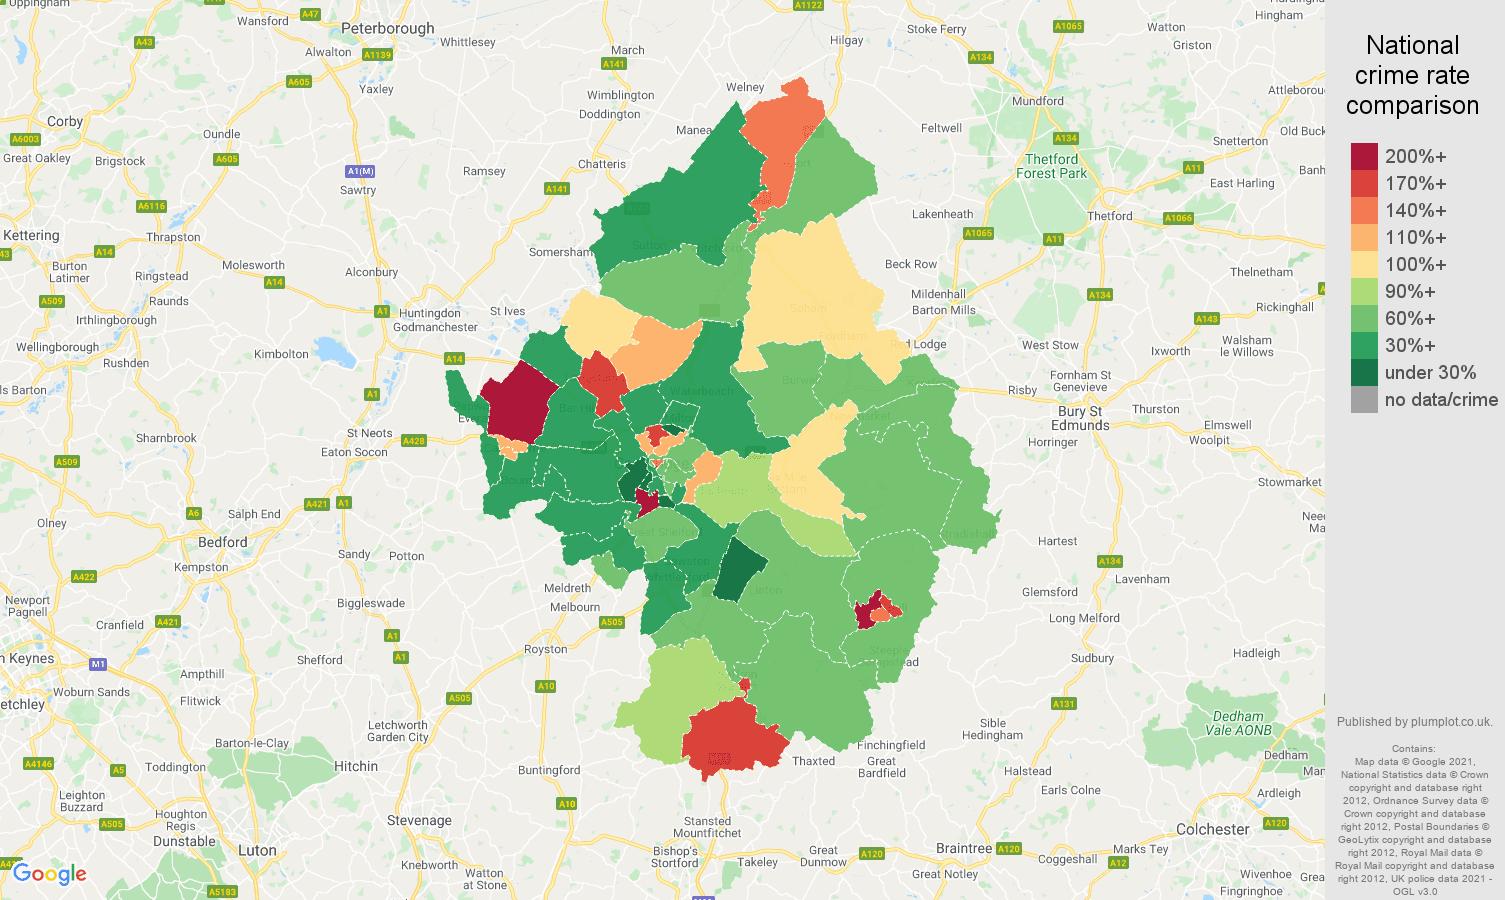 Cambridge criminal damage and arson crime rate comparison map